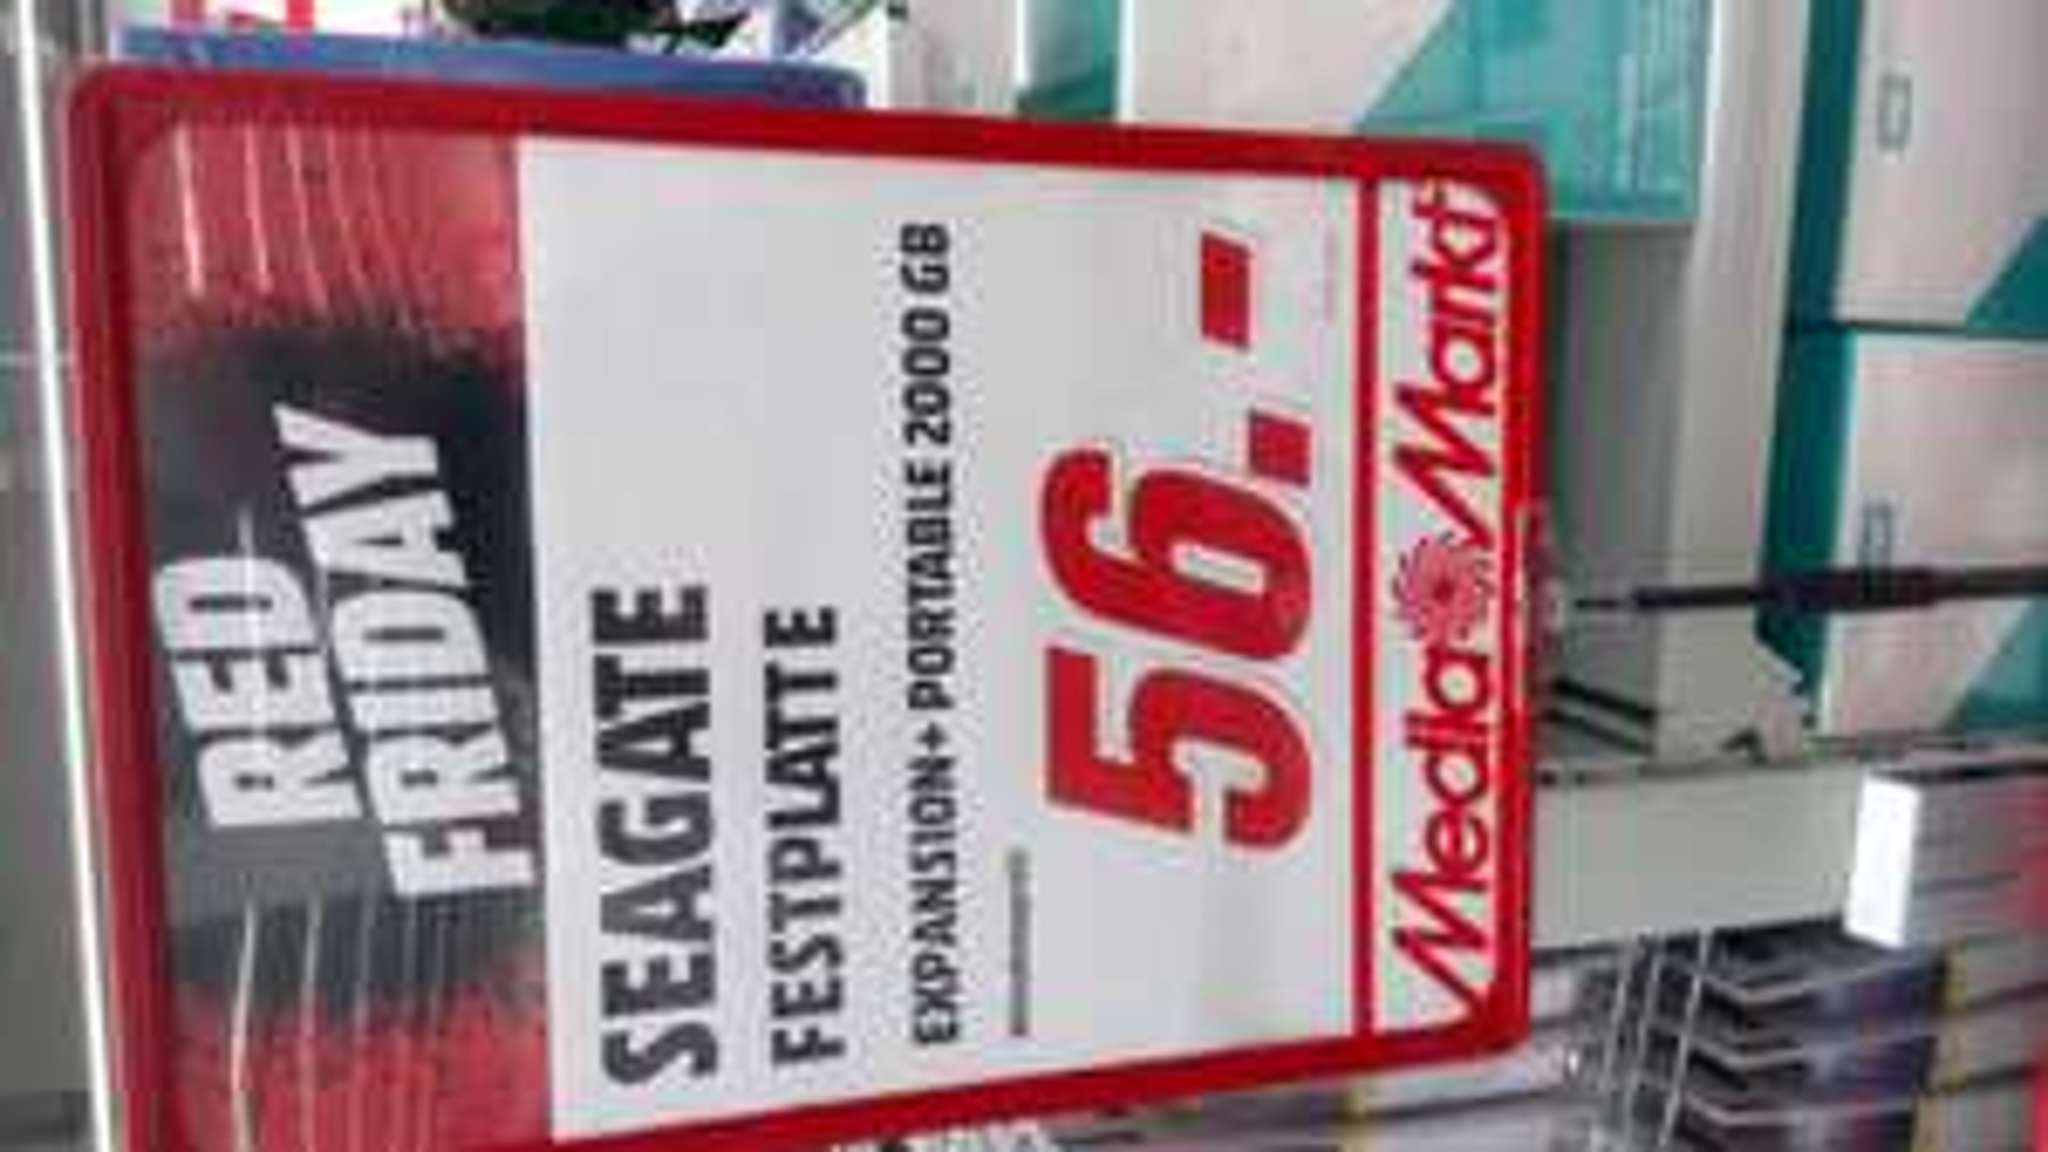 Seagate expansion + mit 2TB - Lokal MM Buchholz in der Nordheide